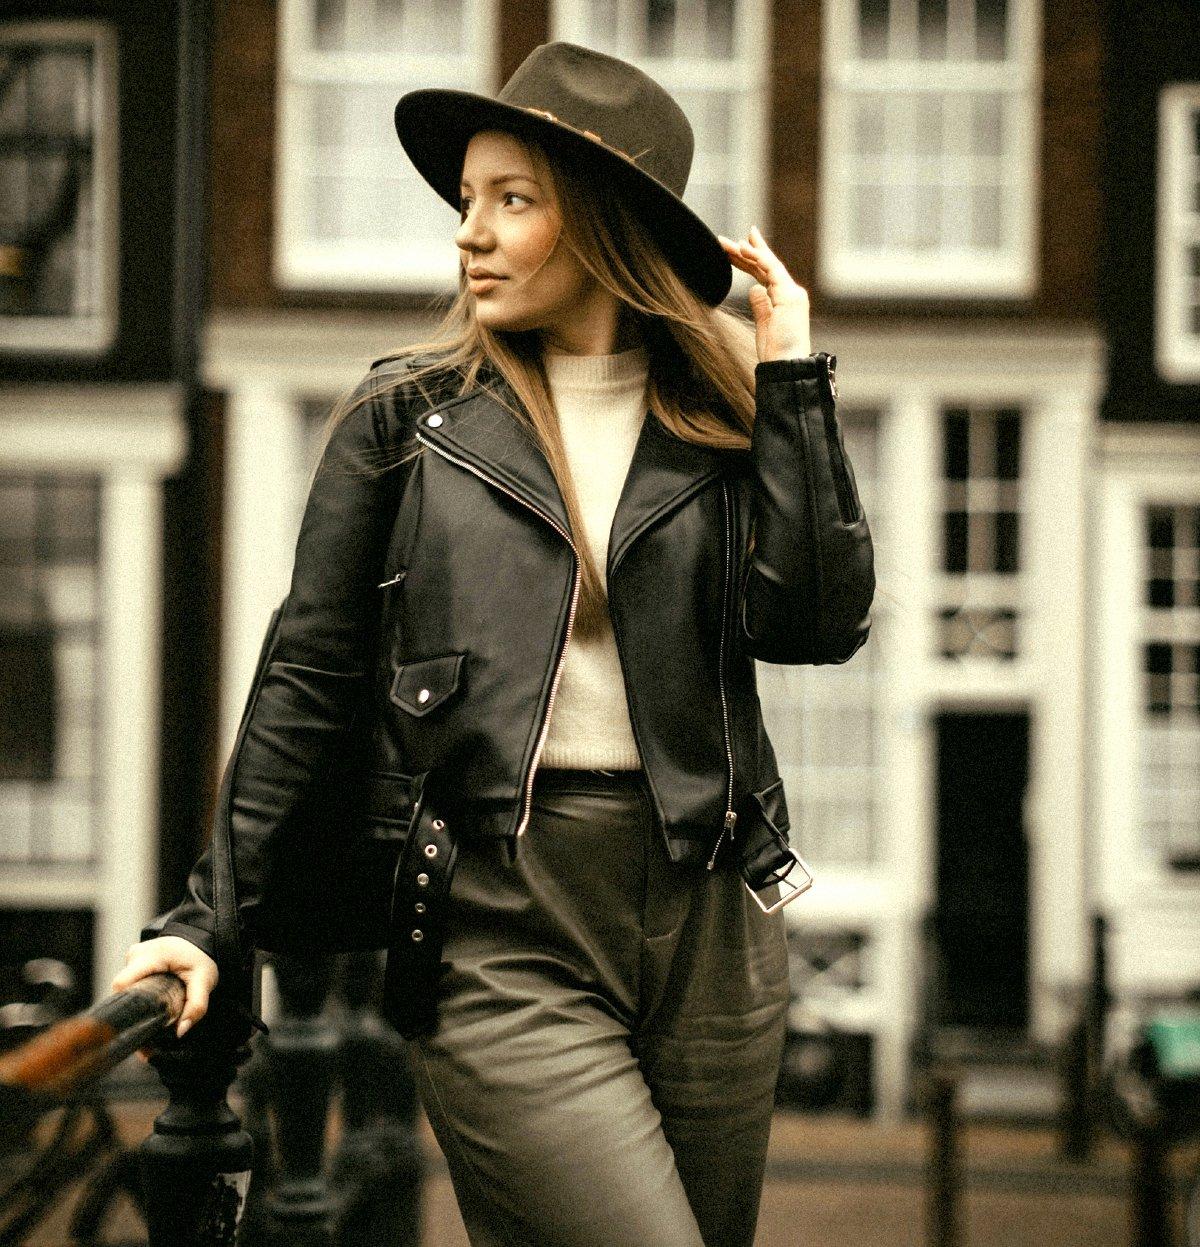 GAYA maskulin mampu ditonjolkan dengan mengayakan jaket kulit. - FOTO Google